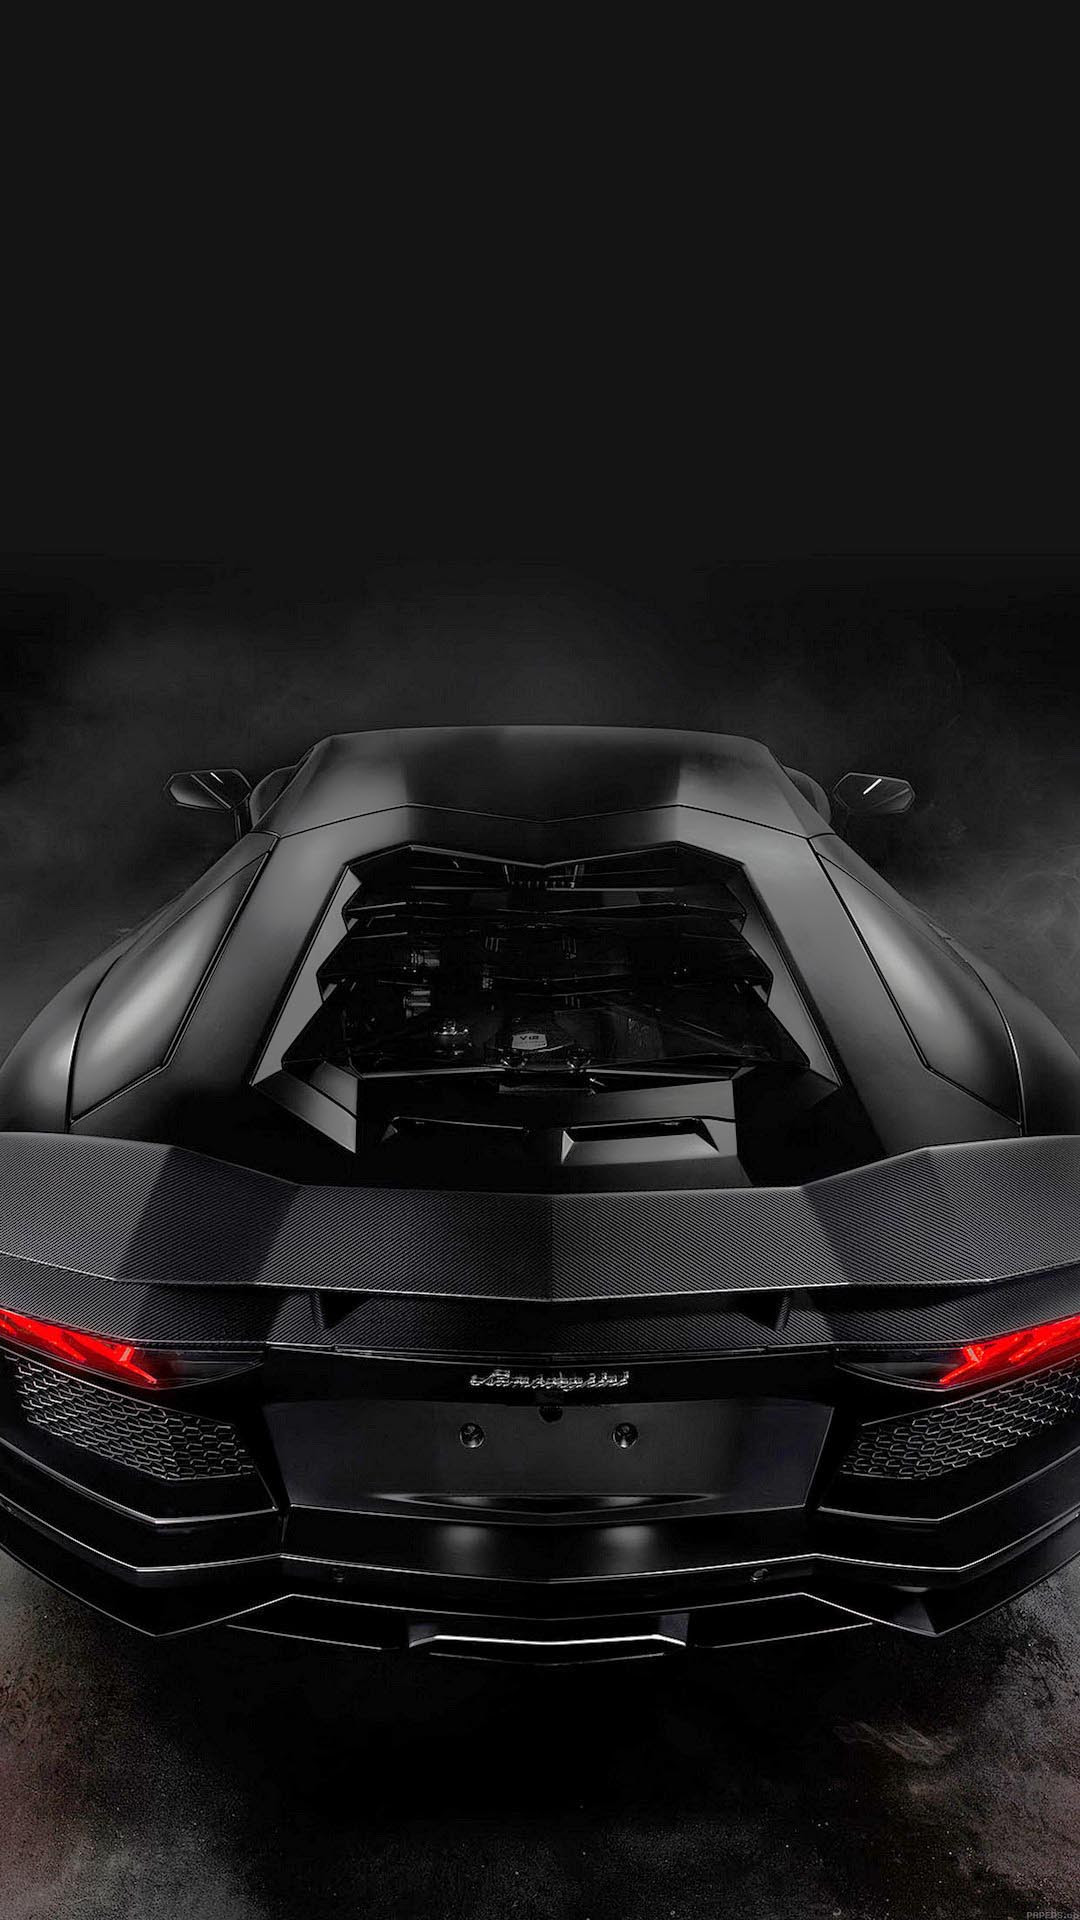 Lamorghini Aventador dark - best htc wallpaper